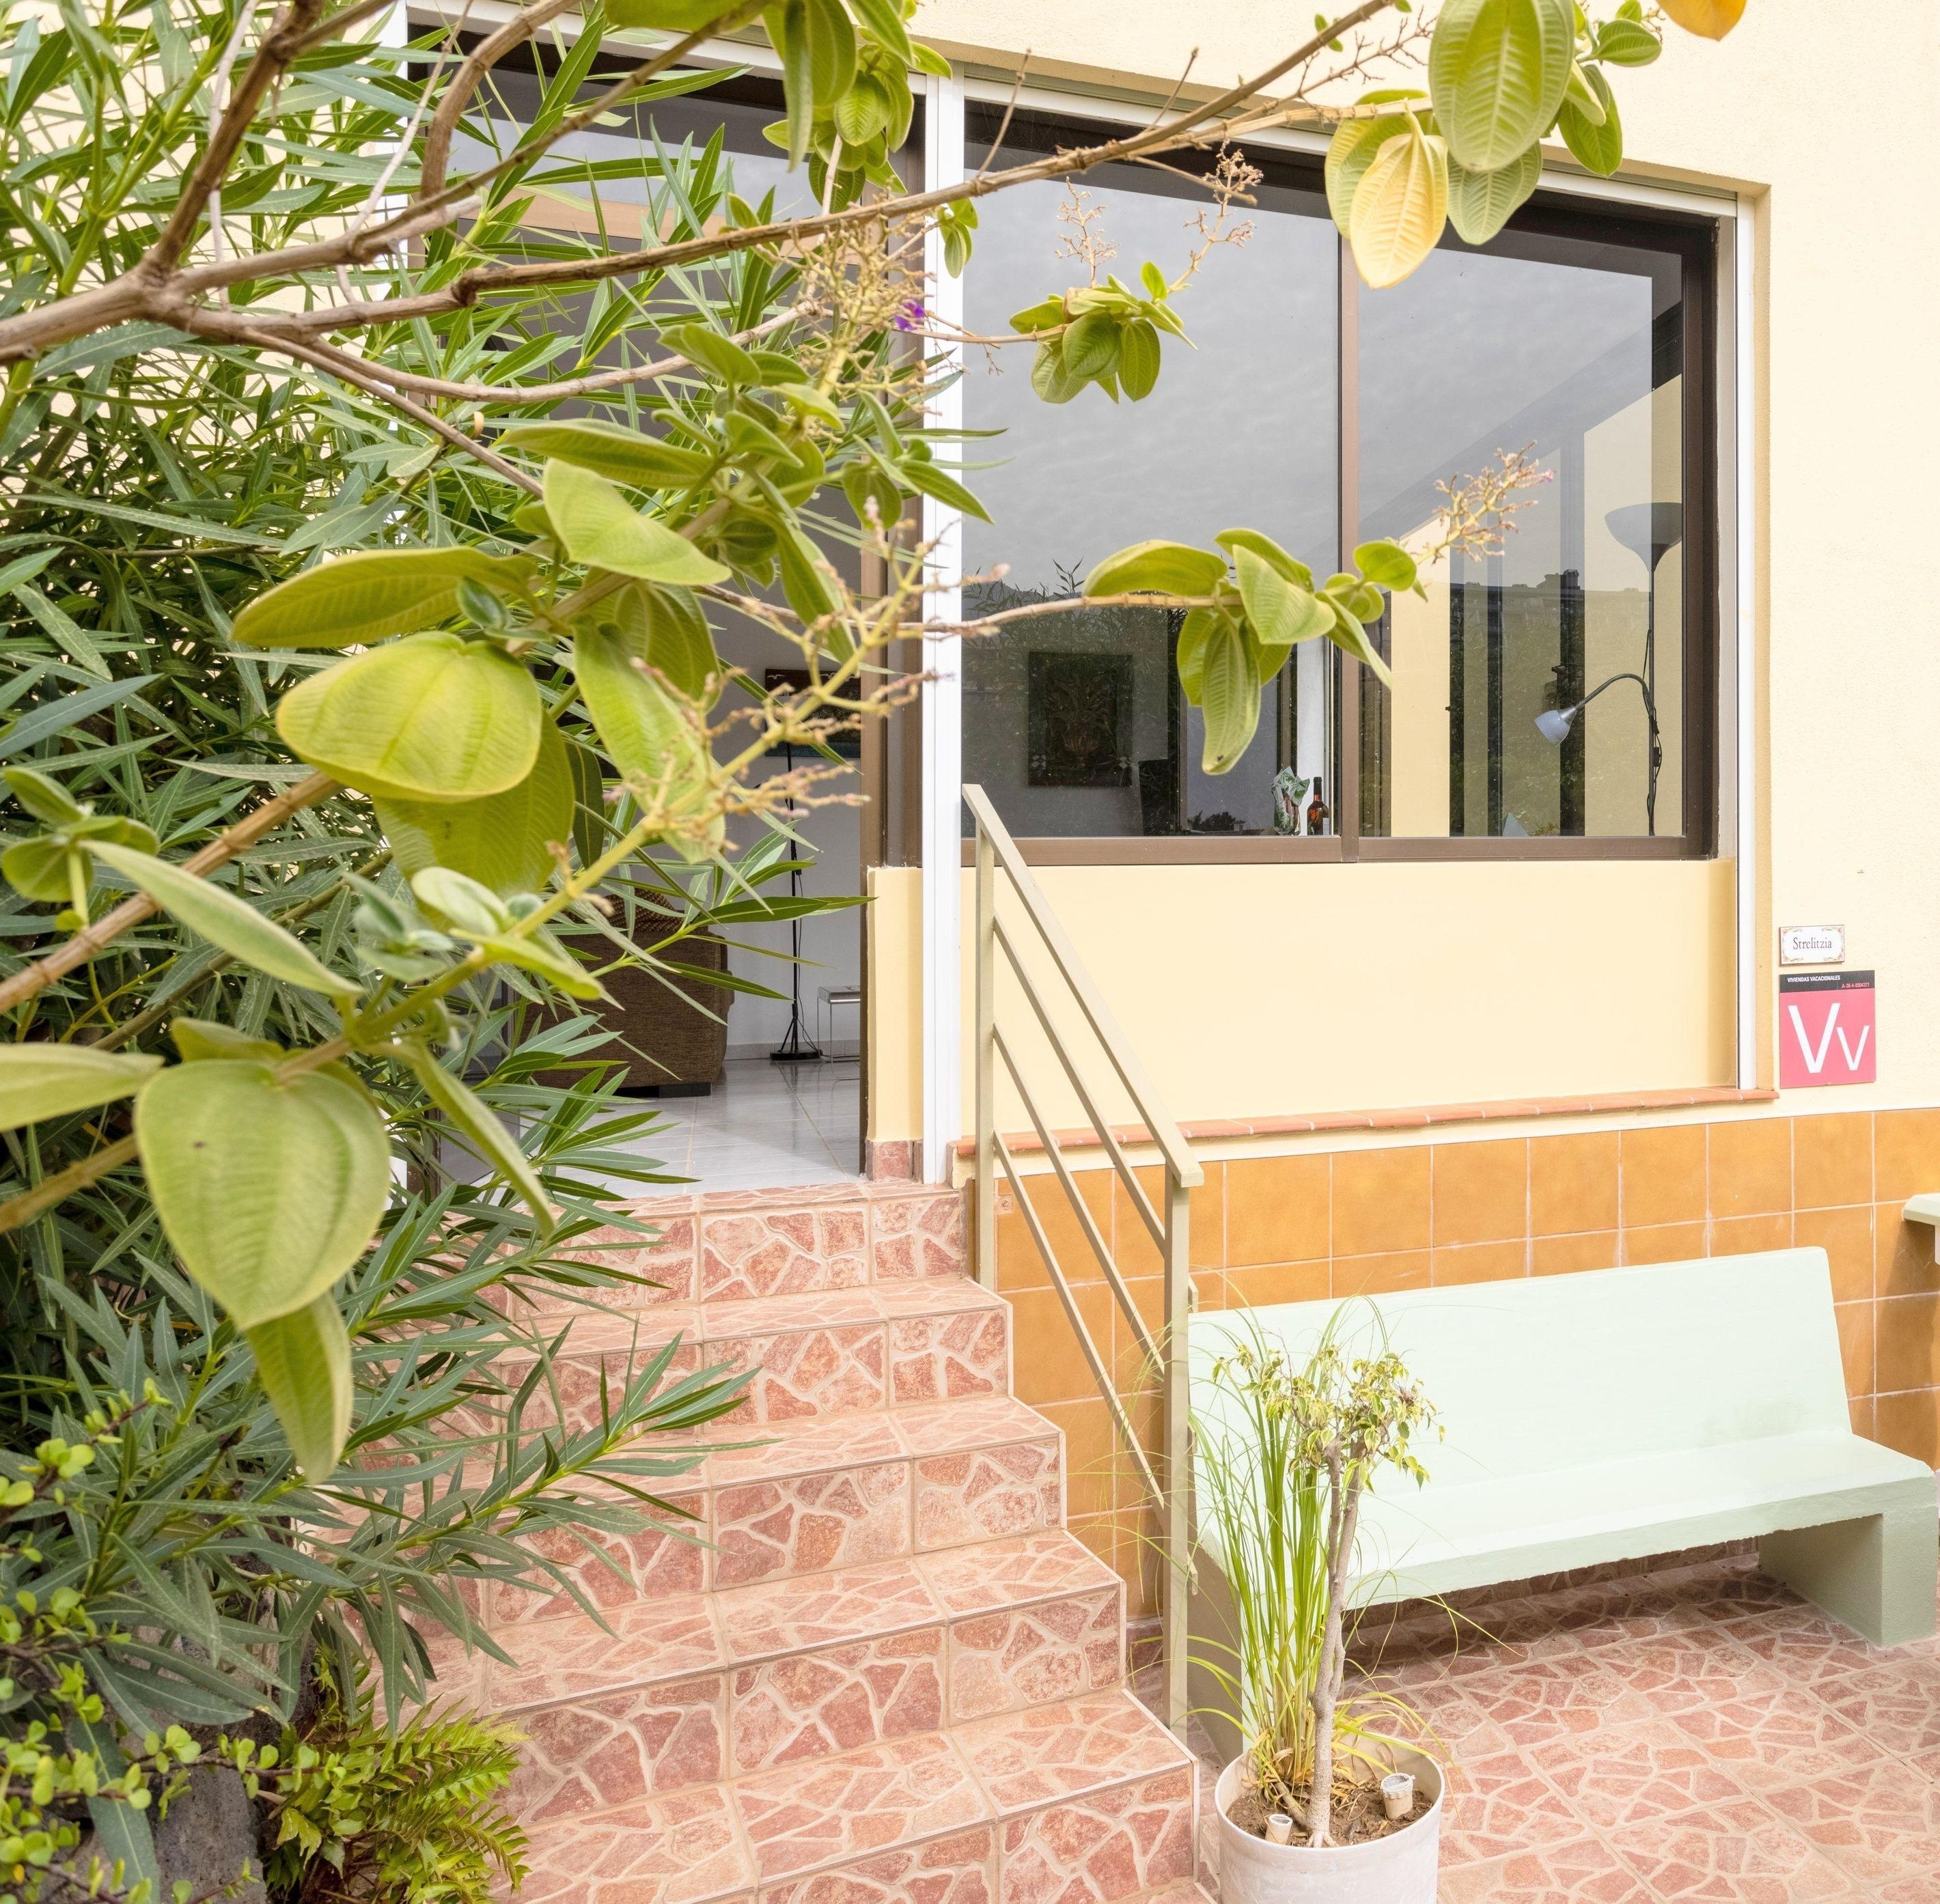 Appartement de vacances Fewo Strelitzia, im Grünen, am kleinen See, direkt am Strelitziengarten, mit Pool, Grill,  (2492987), Santa Ursula, Ténérife, Iles Canaries, Espagne, image 17